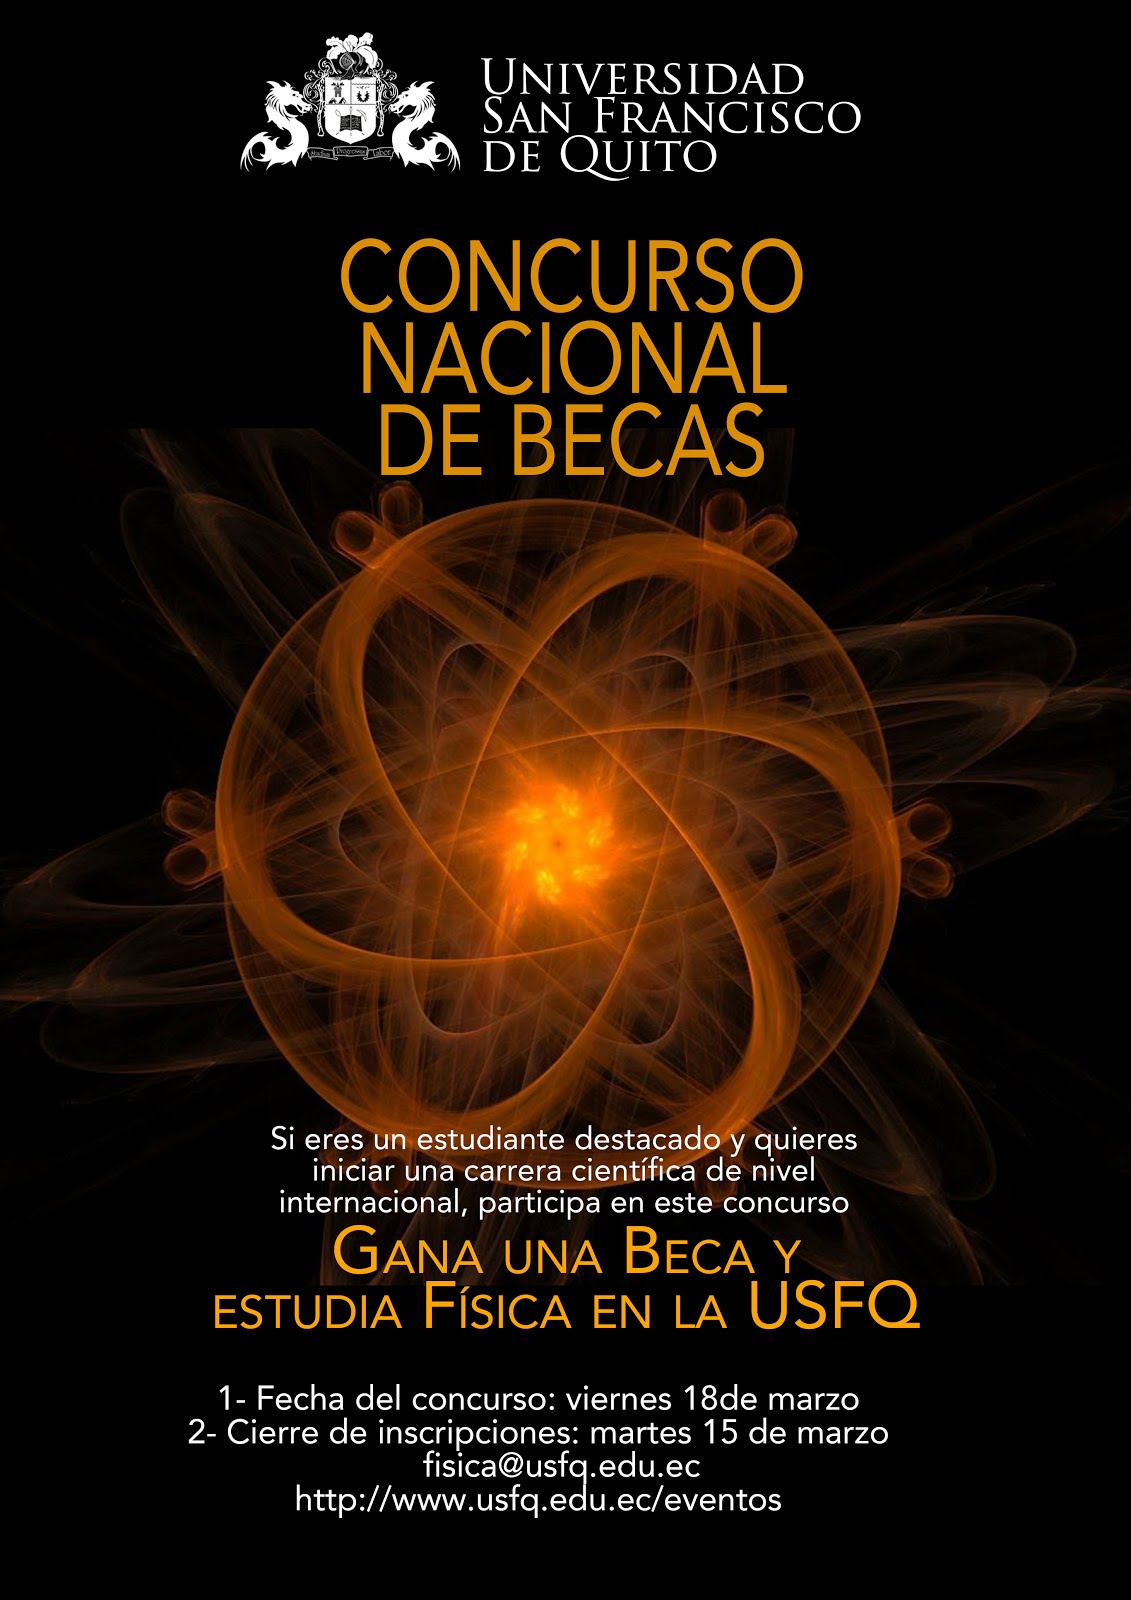 Concurso Nacional de Becas Enrico Fermi 2016